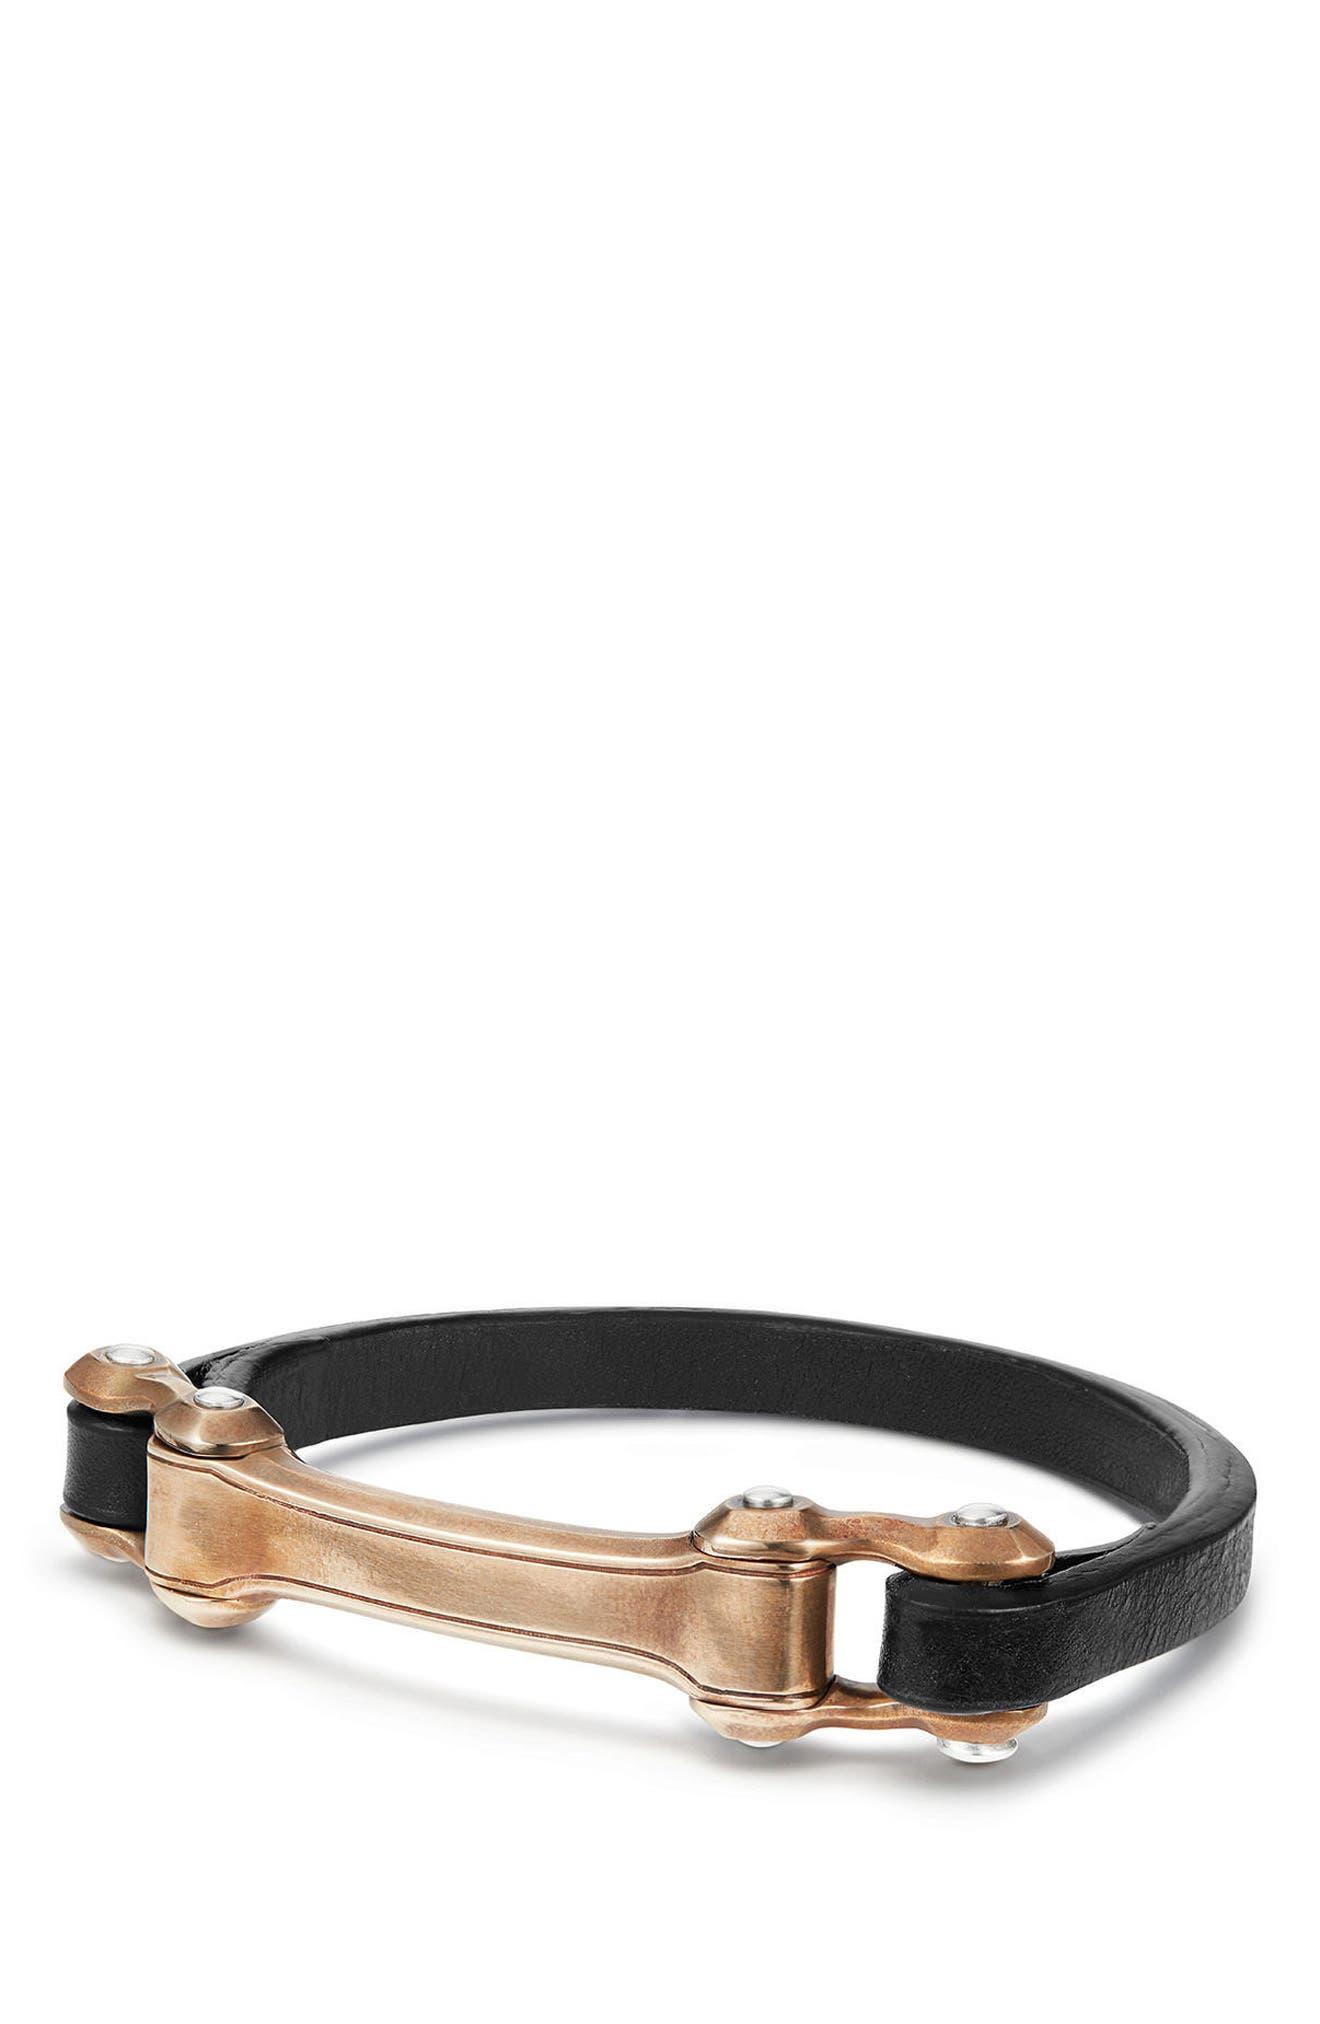 Anvil ID Bracelet,                         Main,                         color, Silver/ Bronze/ Black Leather